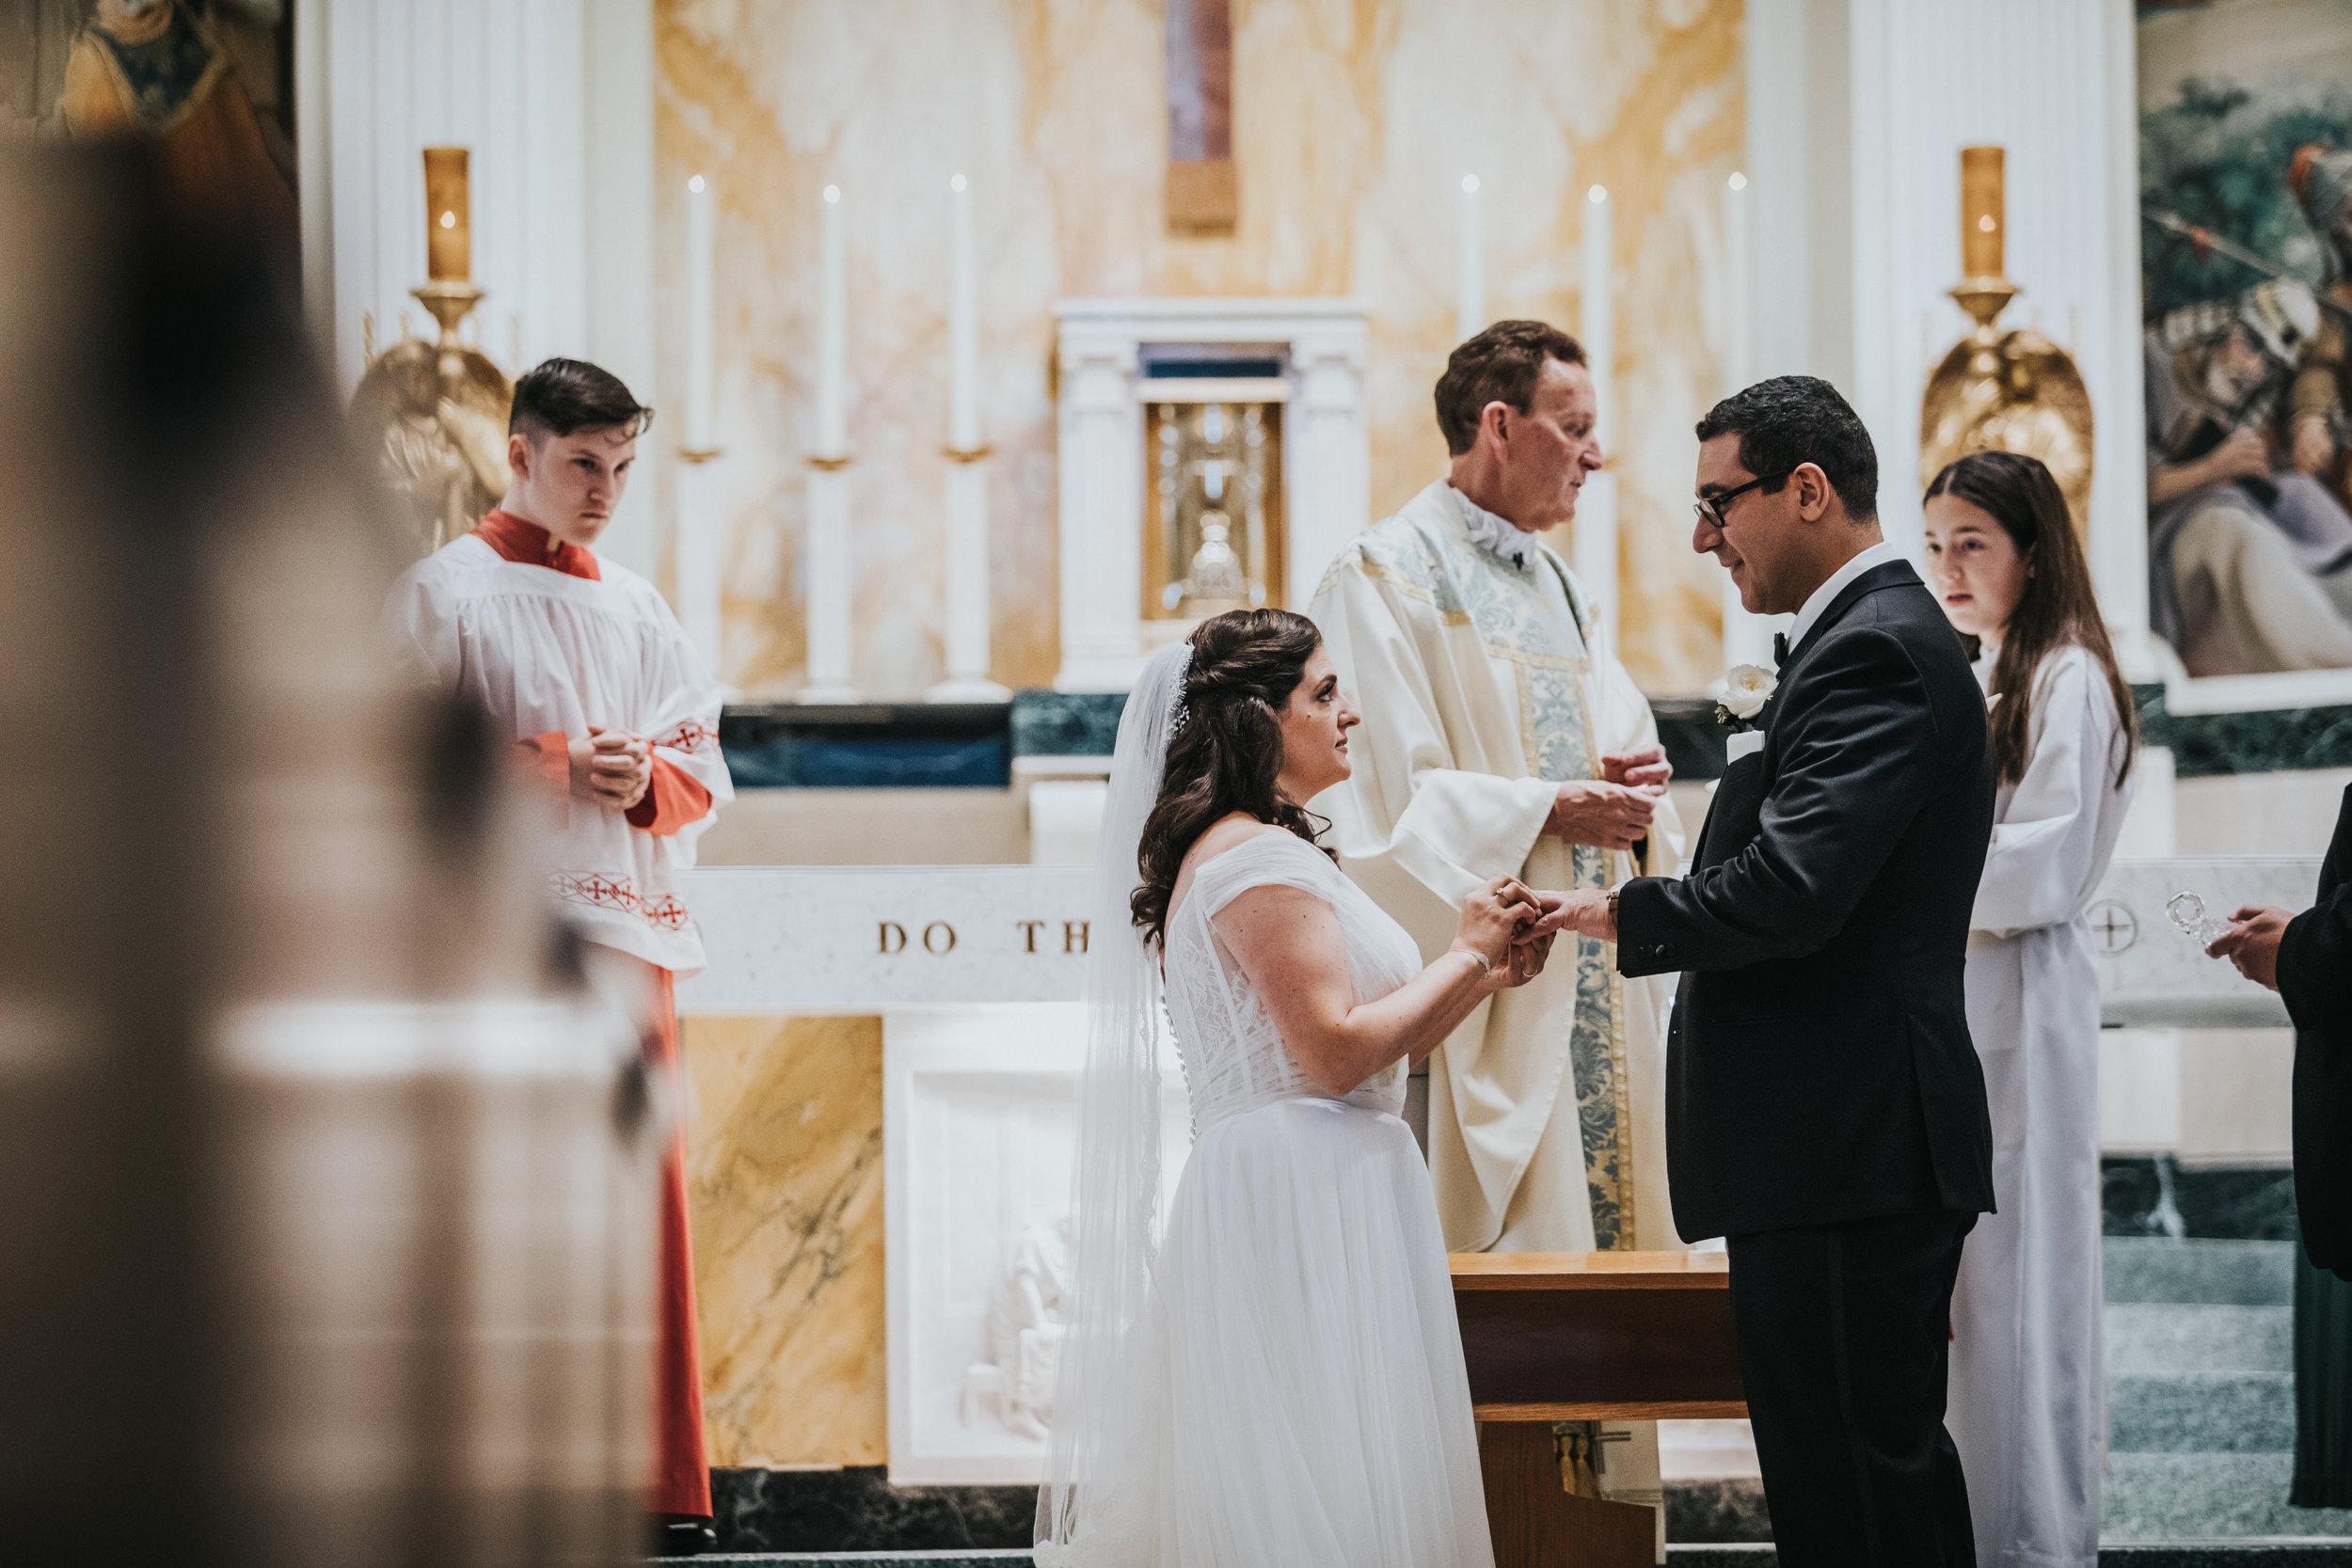 JennaLynnPhotography-NJWeddingPhotographer-Philadelphia-Wedding-ArtsBallroom-Ceremony-57.jpg